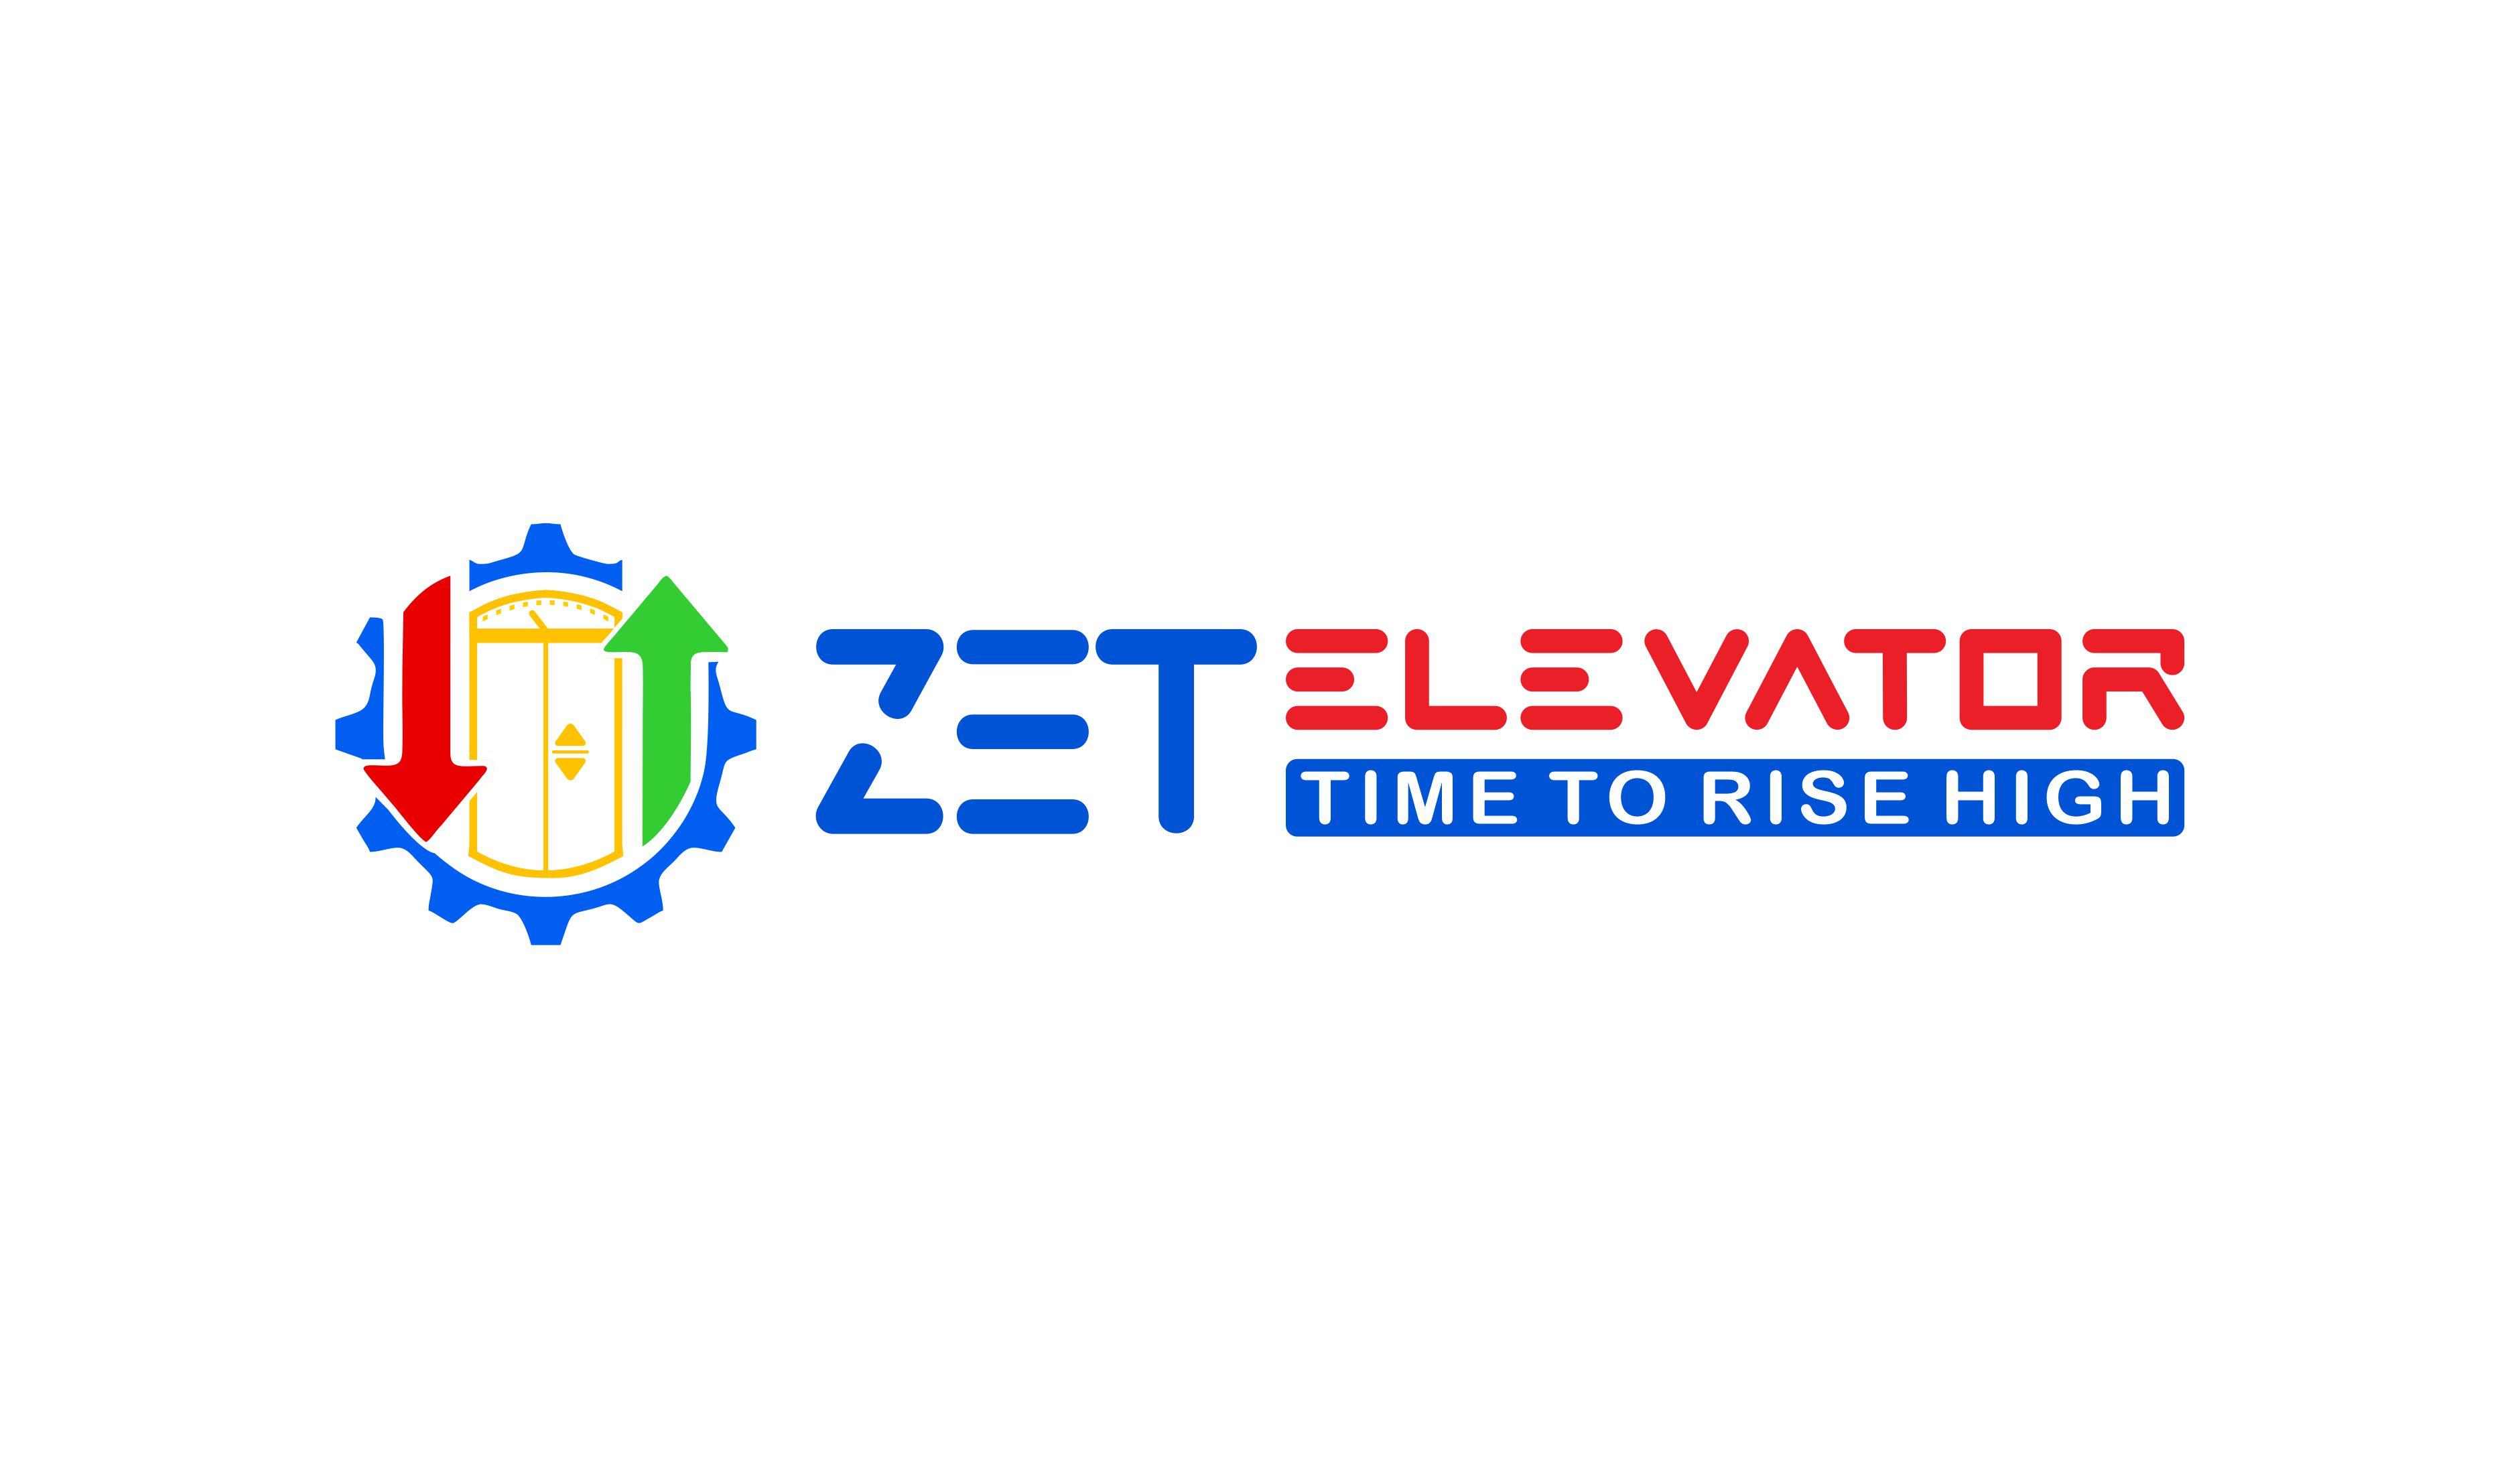 ZET ELEVATOR AND ESCALATORS